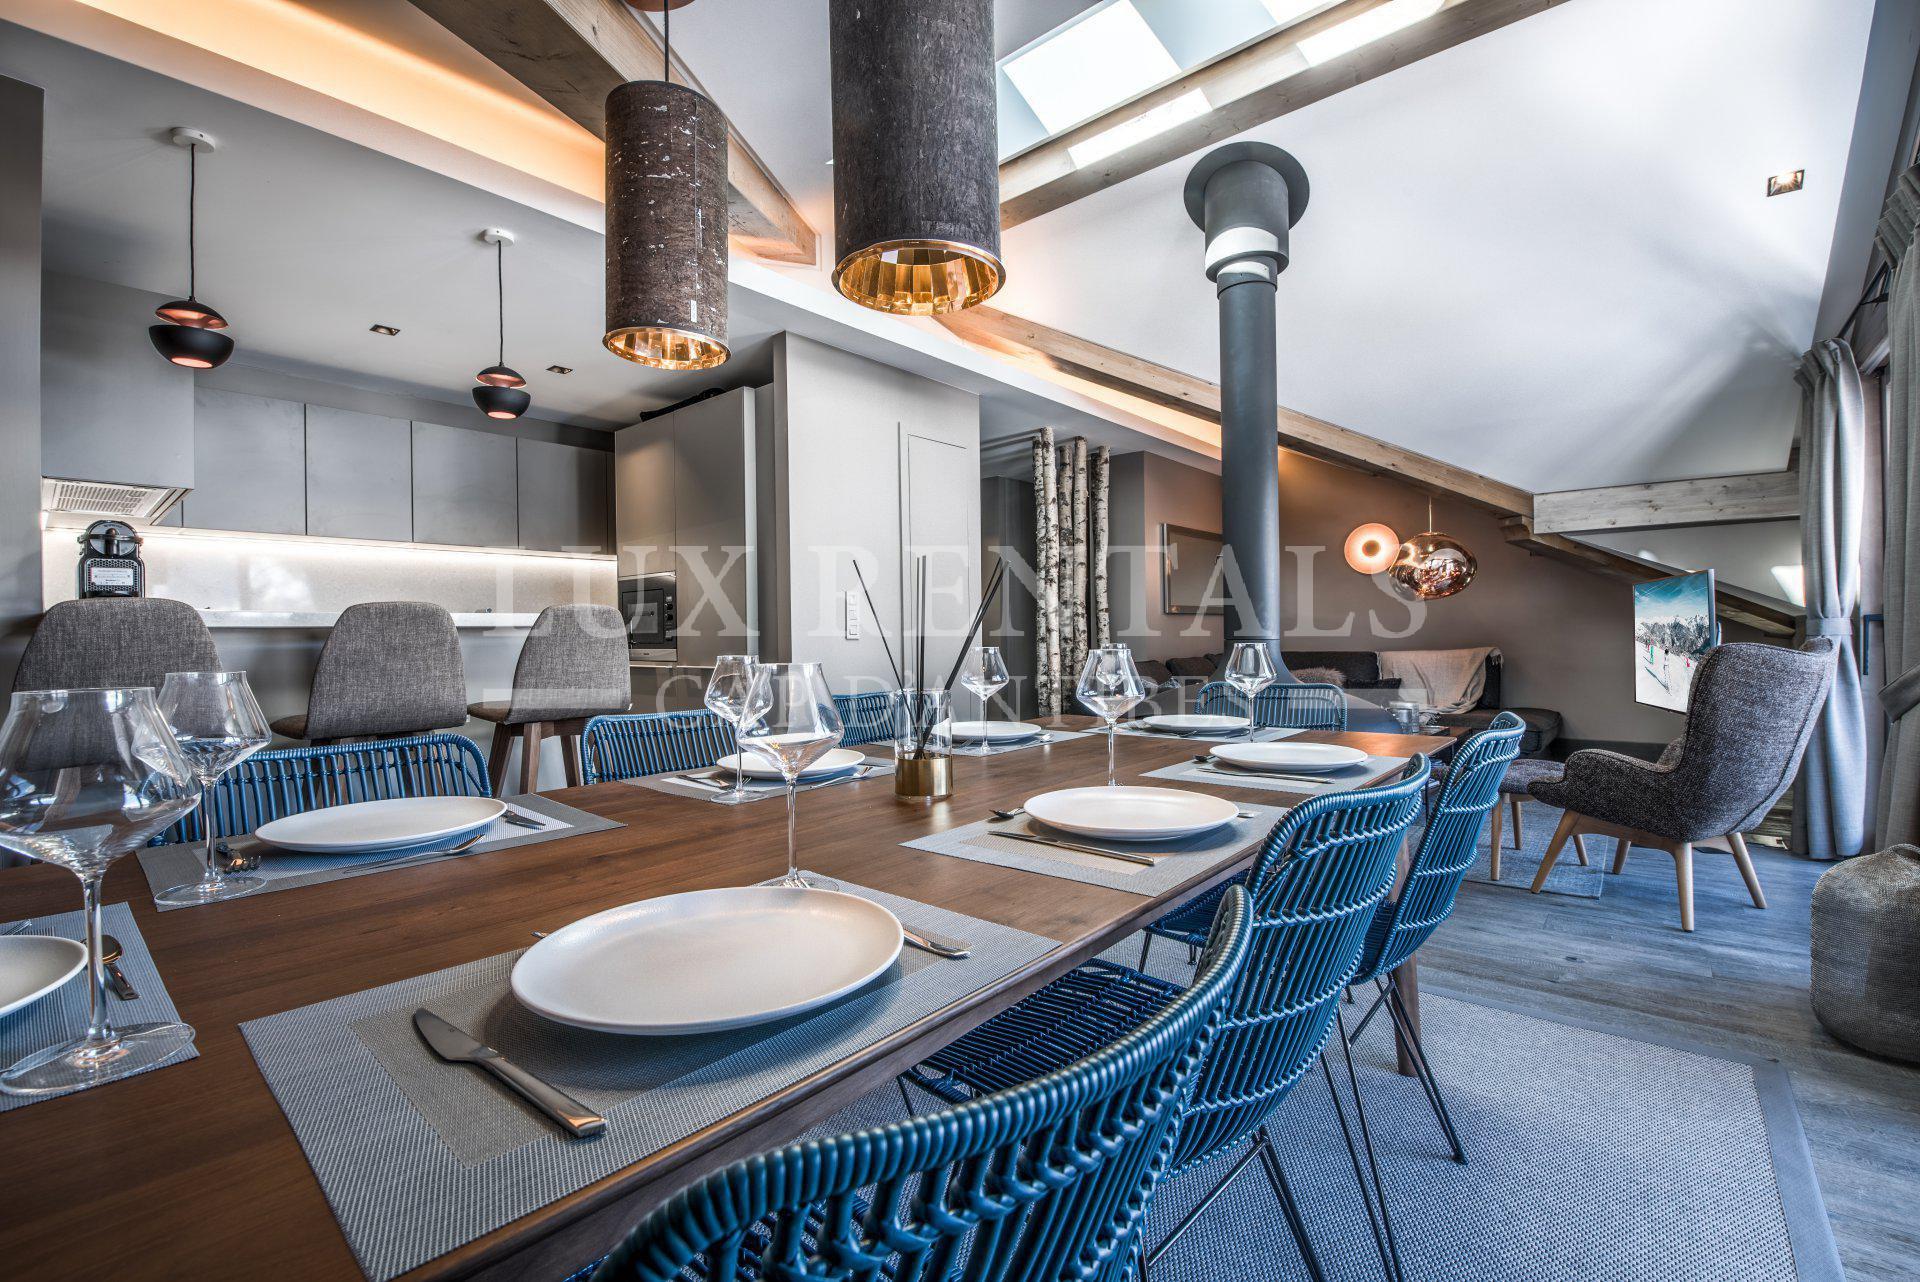 Seasonal rental Apartment - Courchevel Moriond 1650